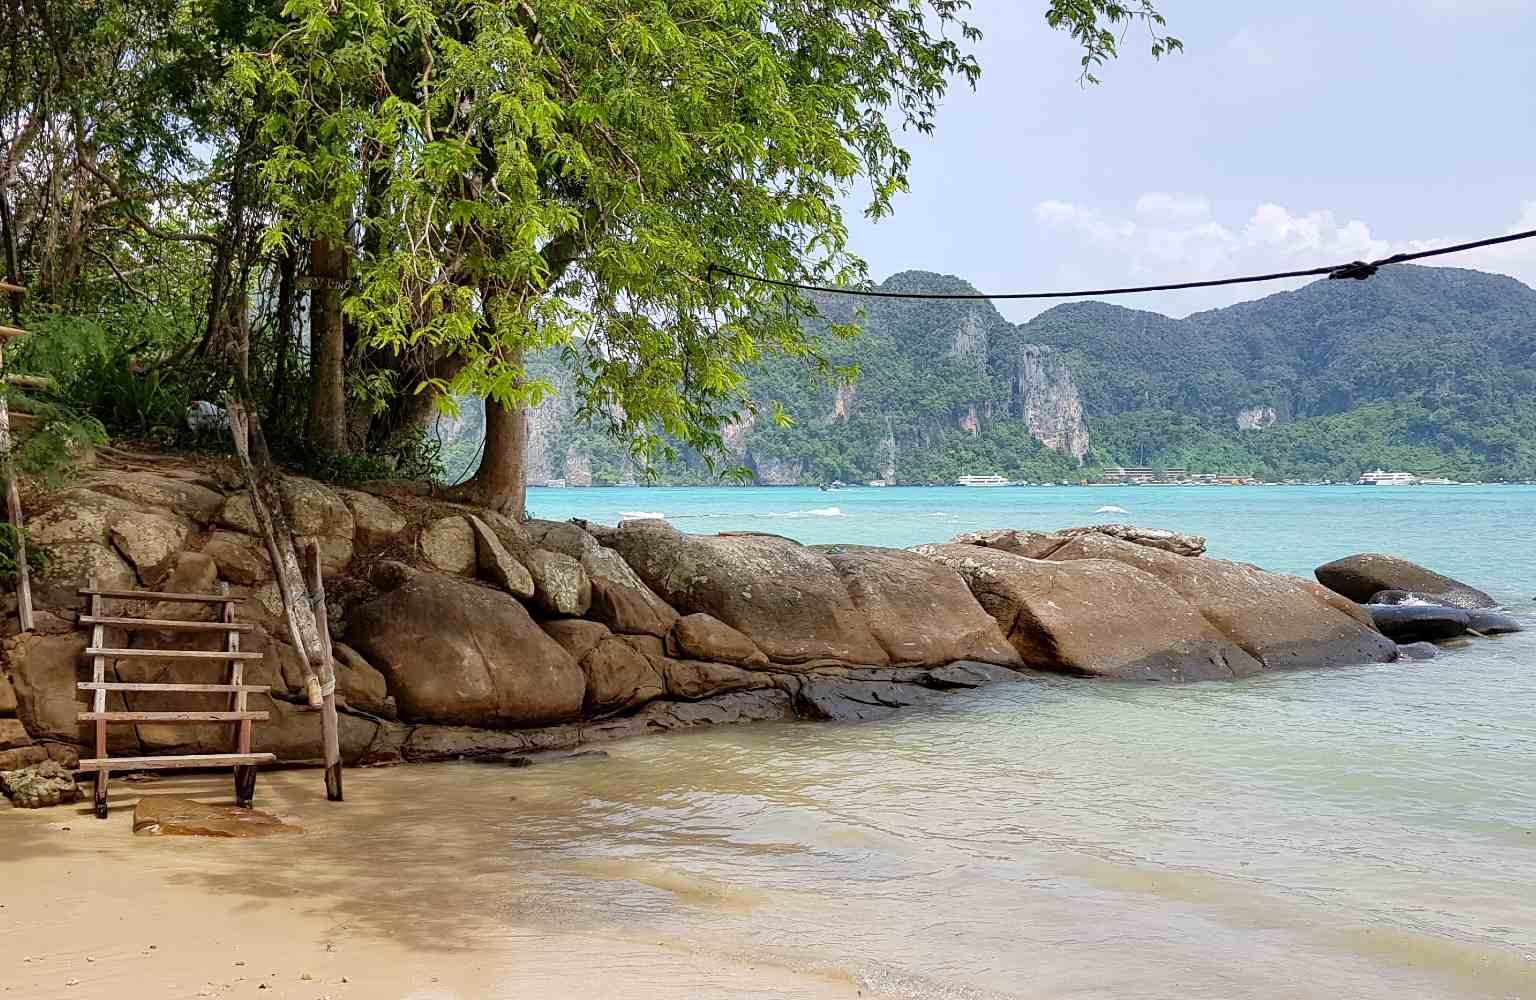 Beach on the way to Long Beach, Koh Phi Phi